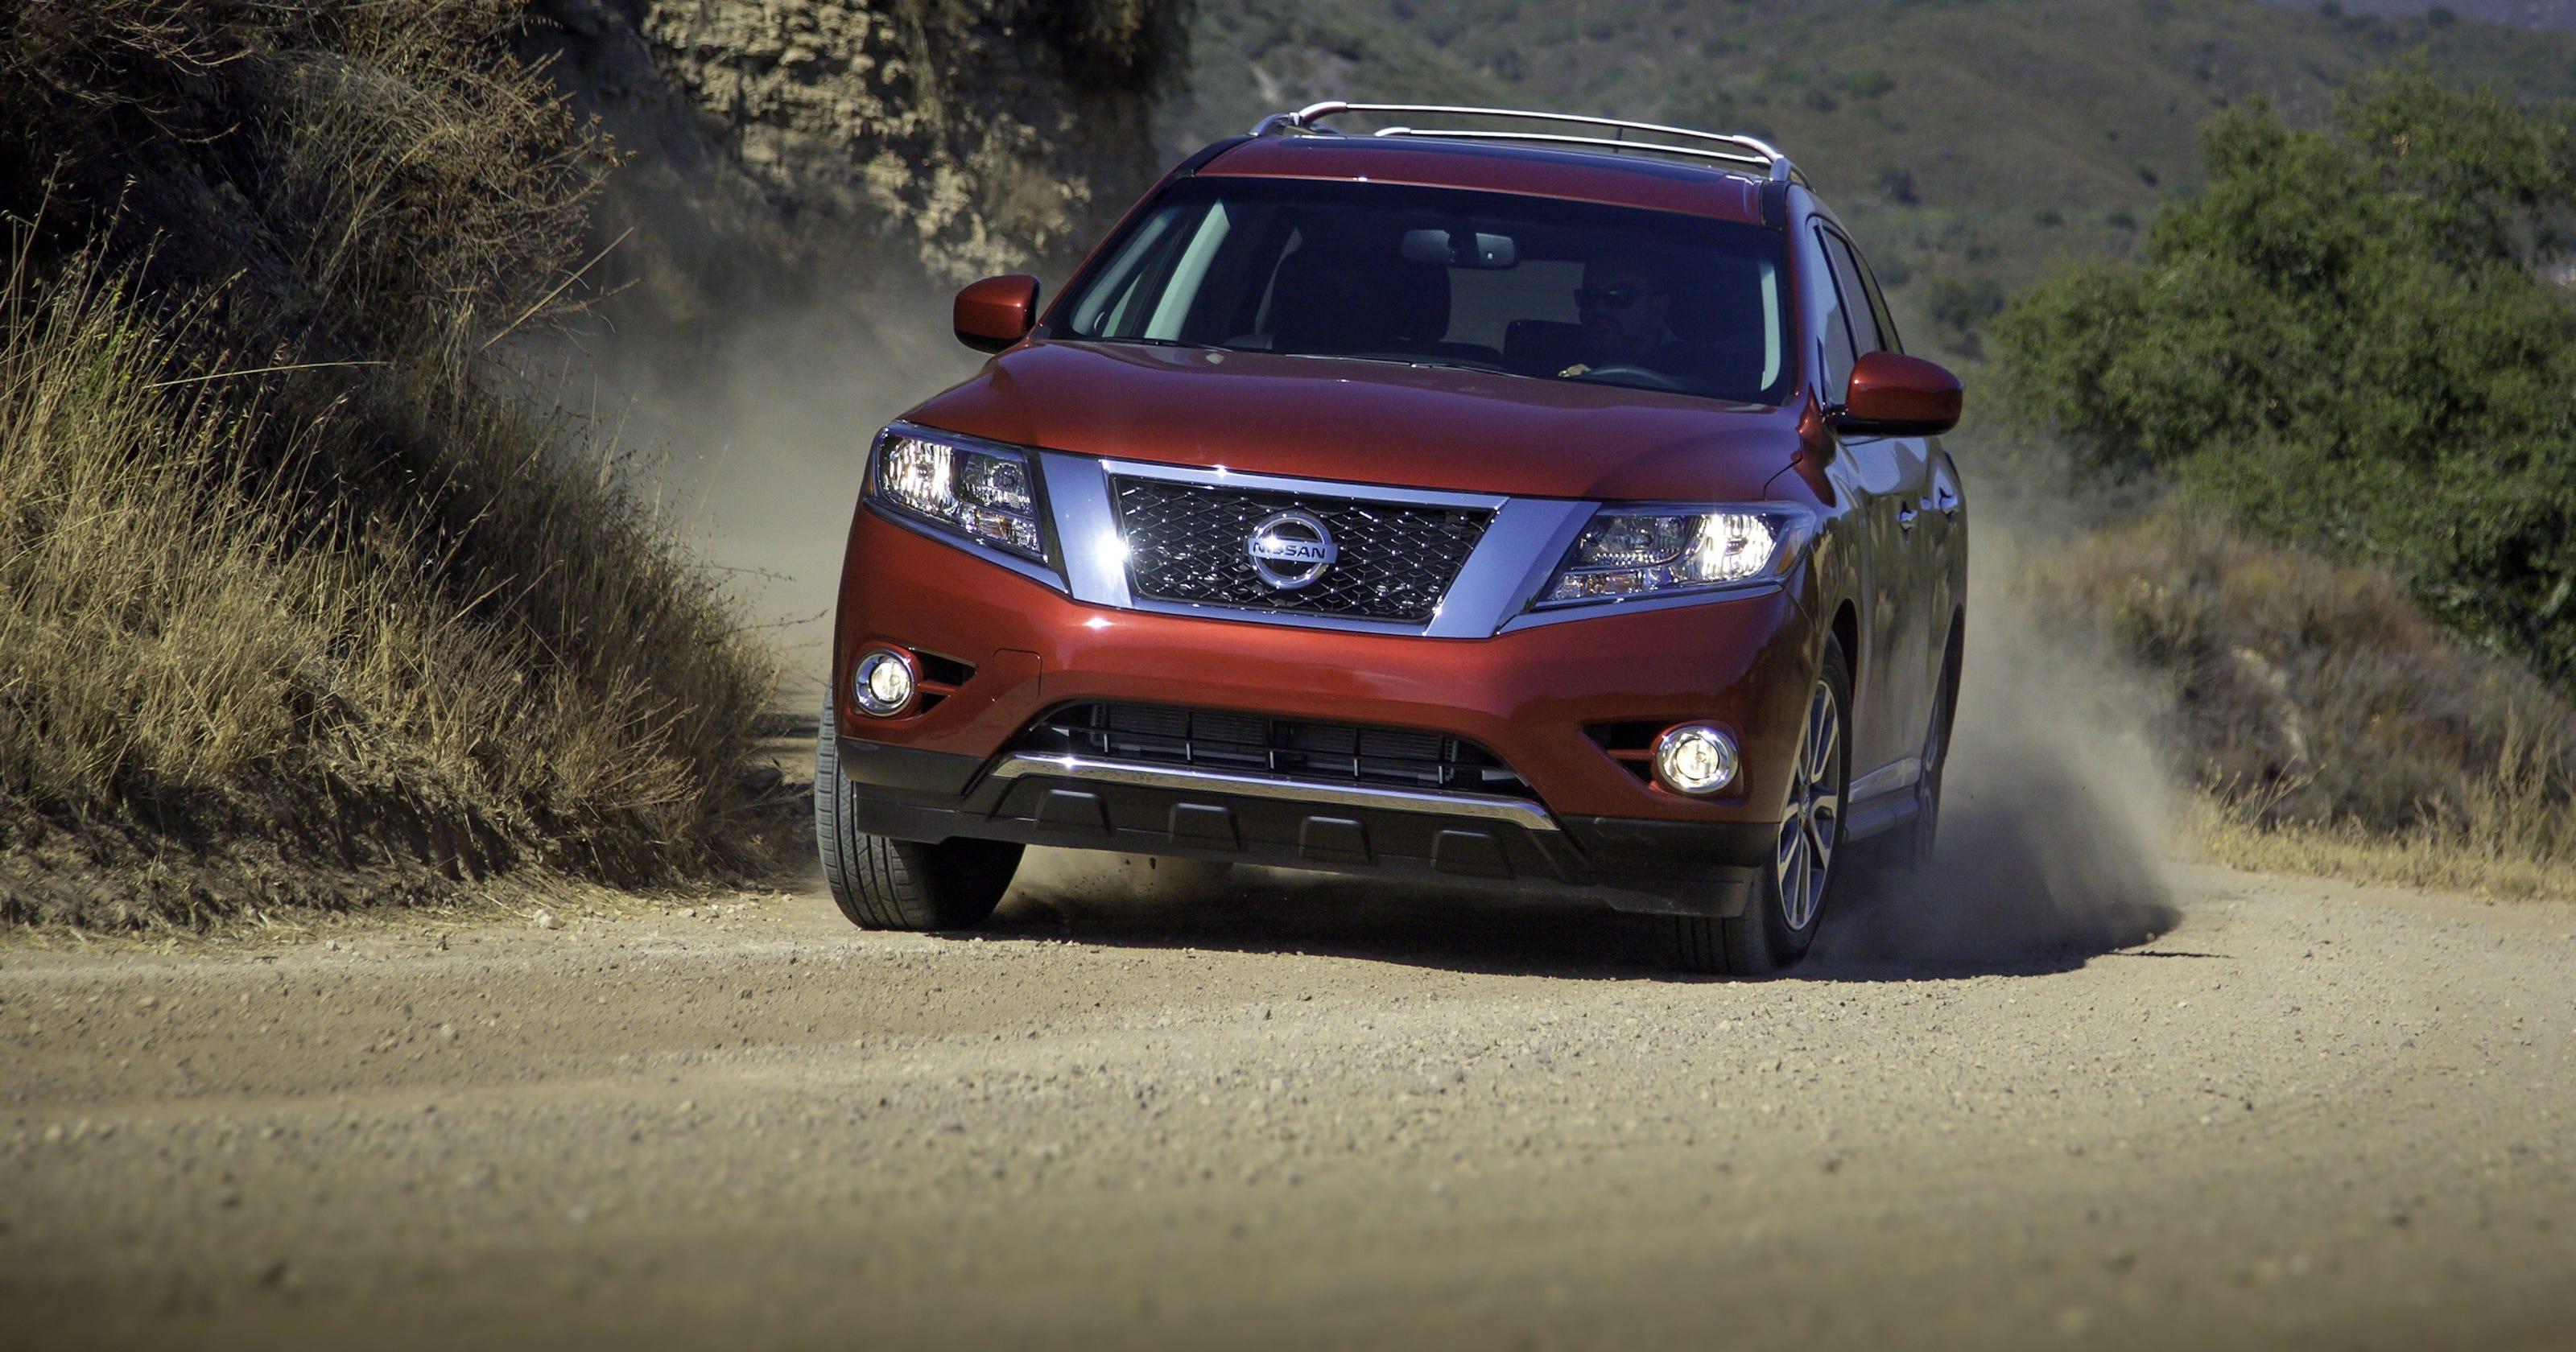 Test Drive: Nissan Pathfinder a big smoothie